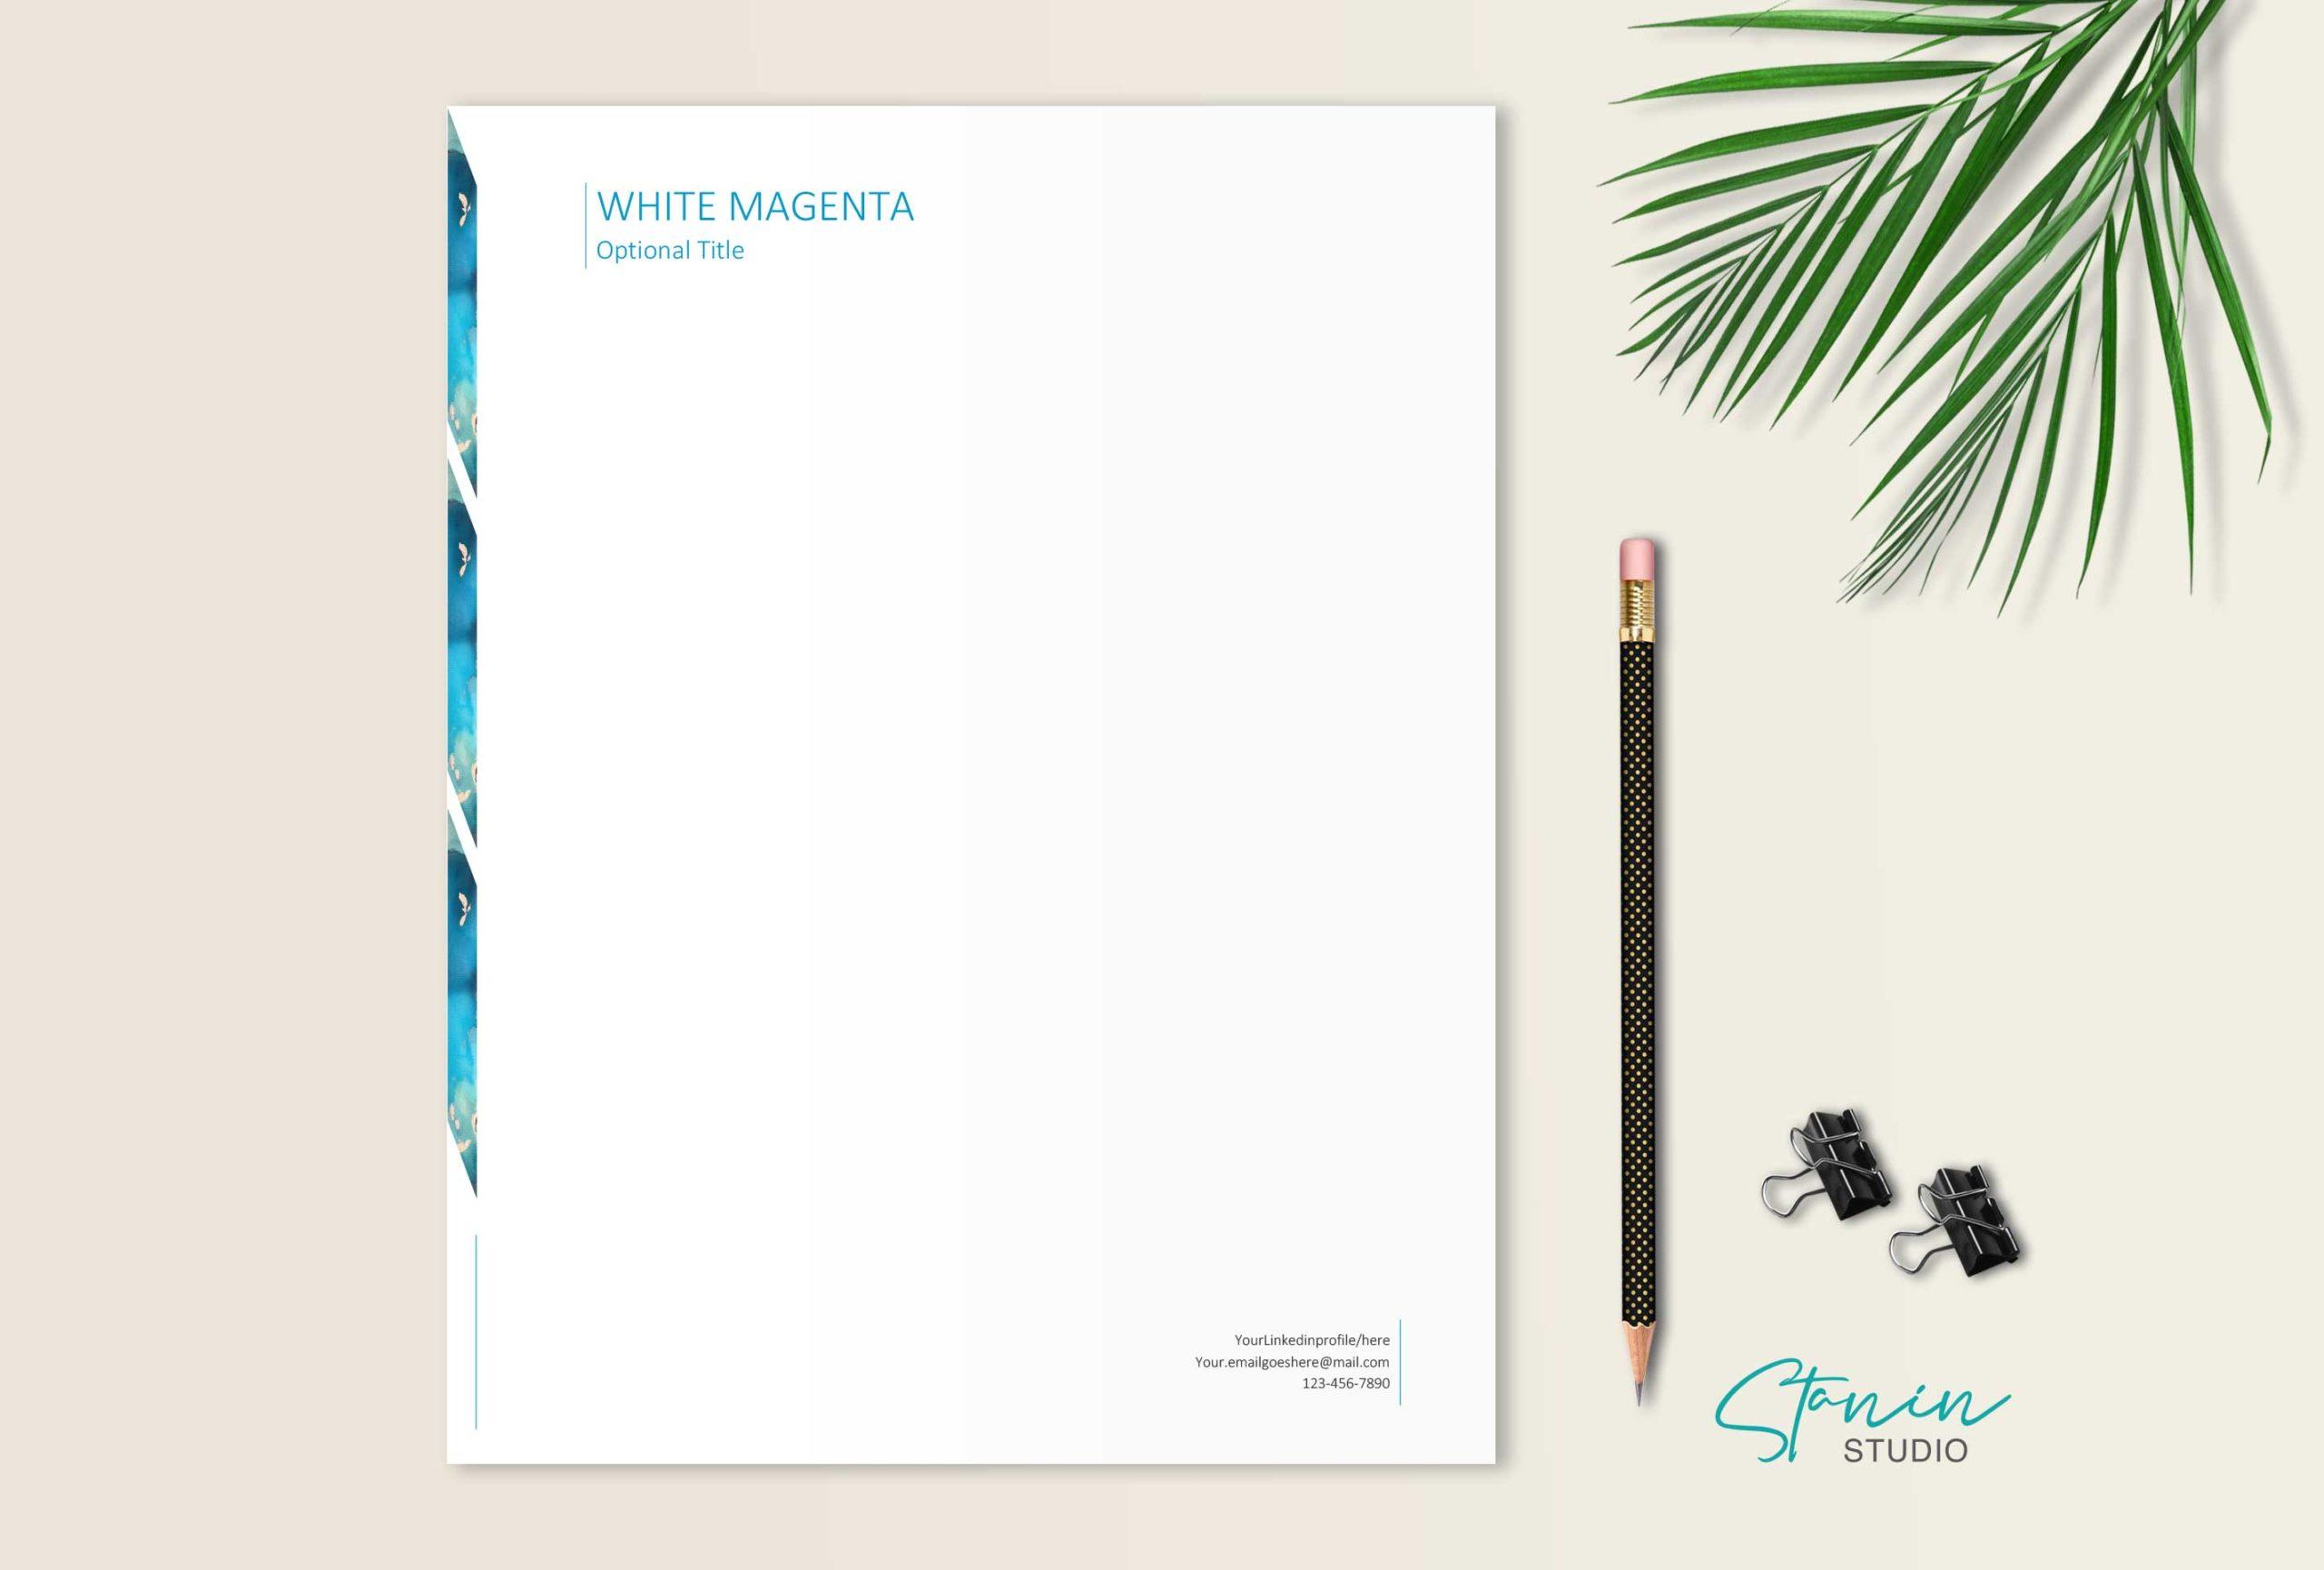 Letterhead For Cover Letter from crella.sfo2.cdn.digitaloceanspaces.com